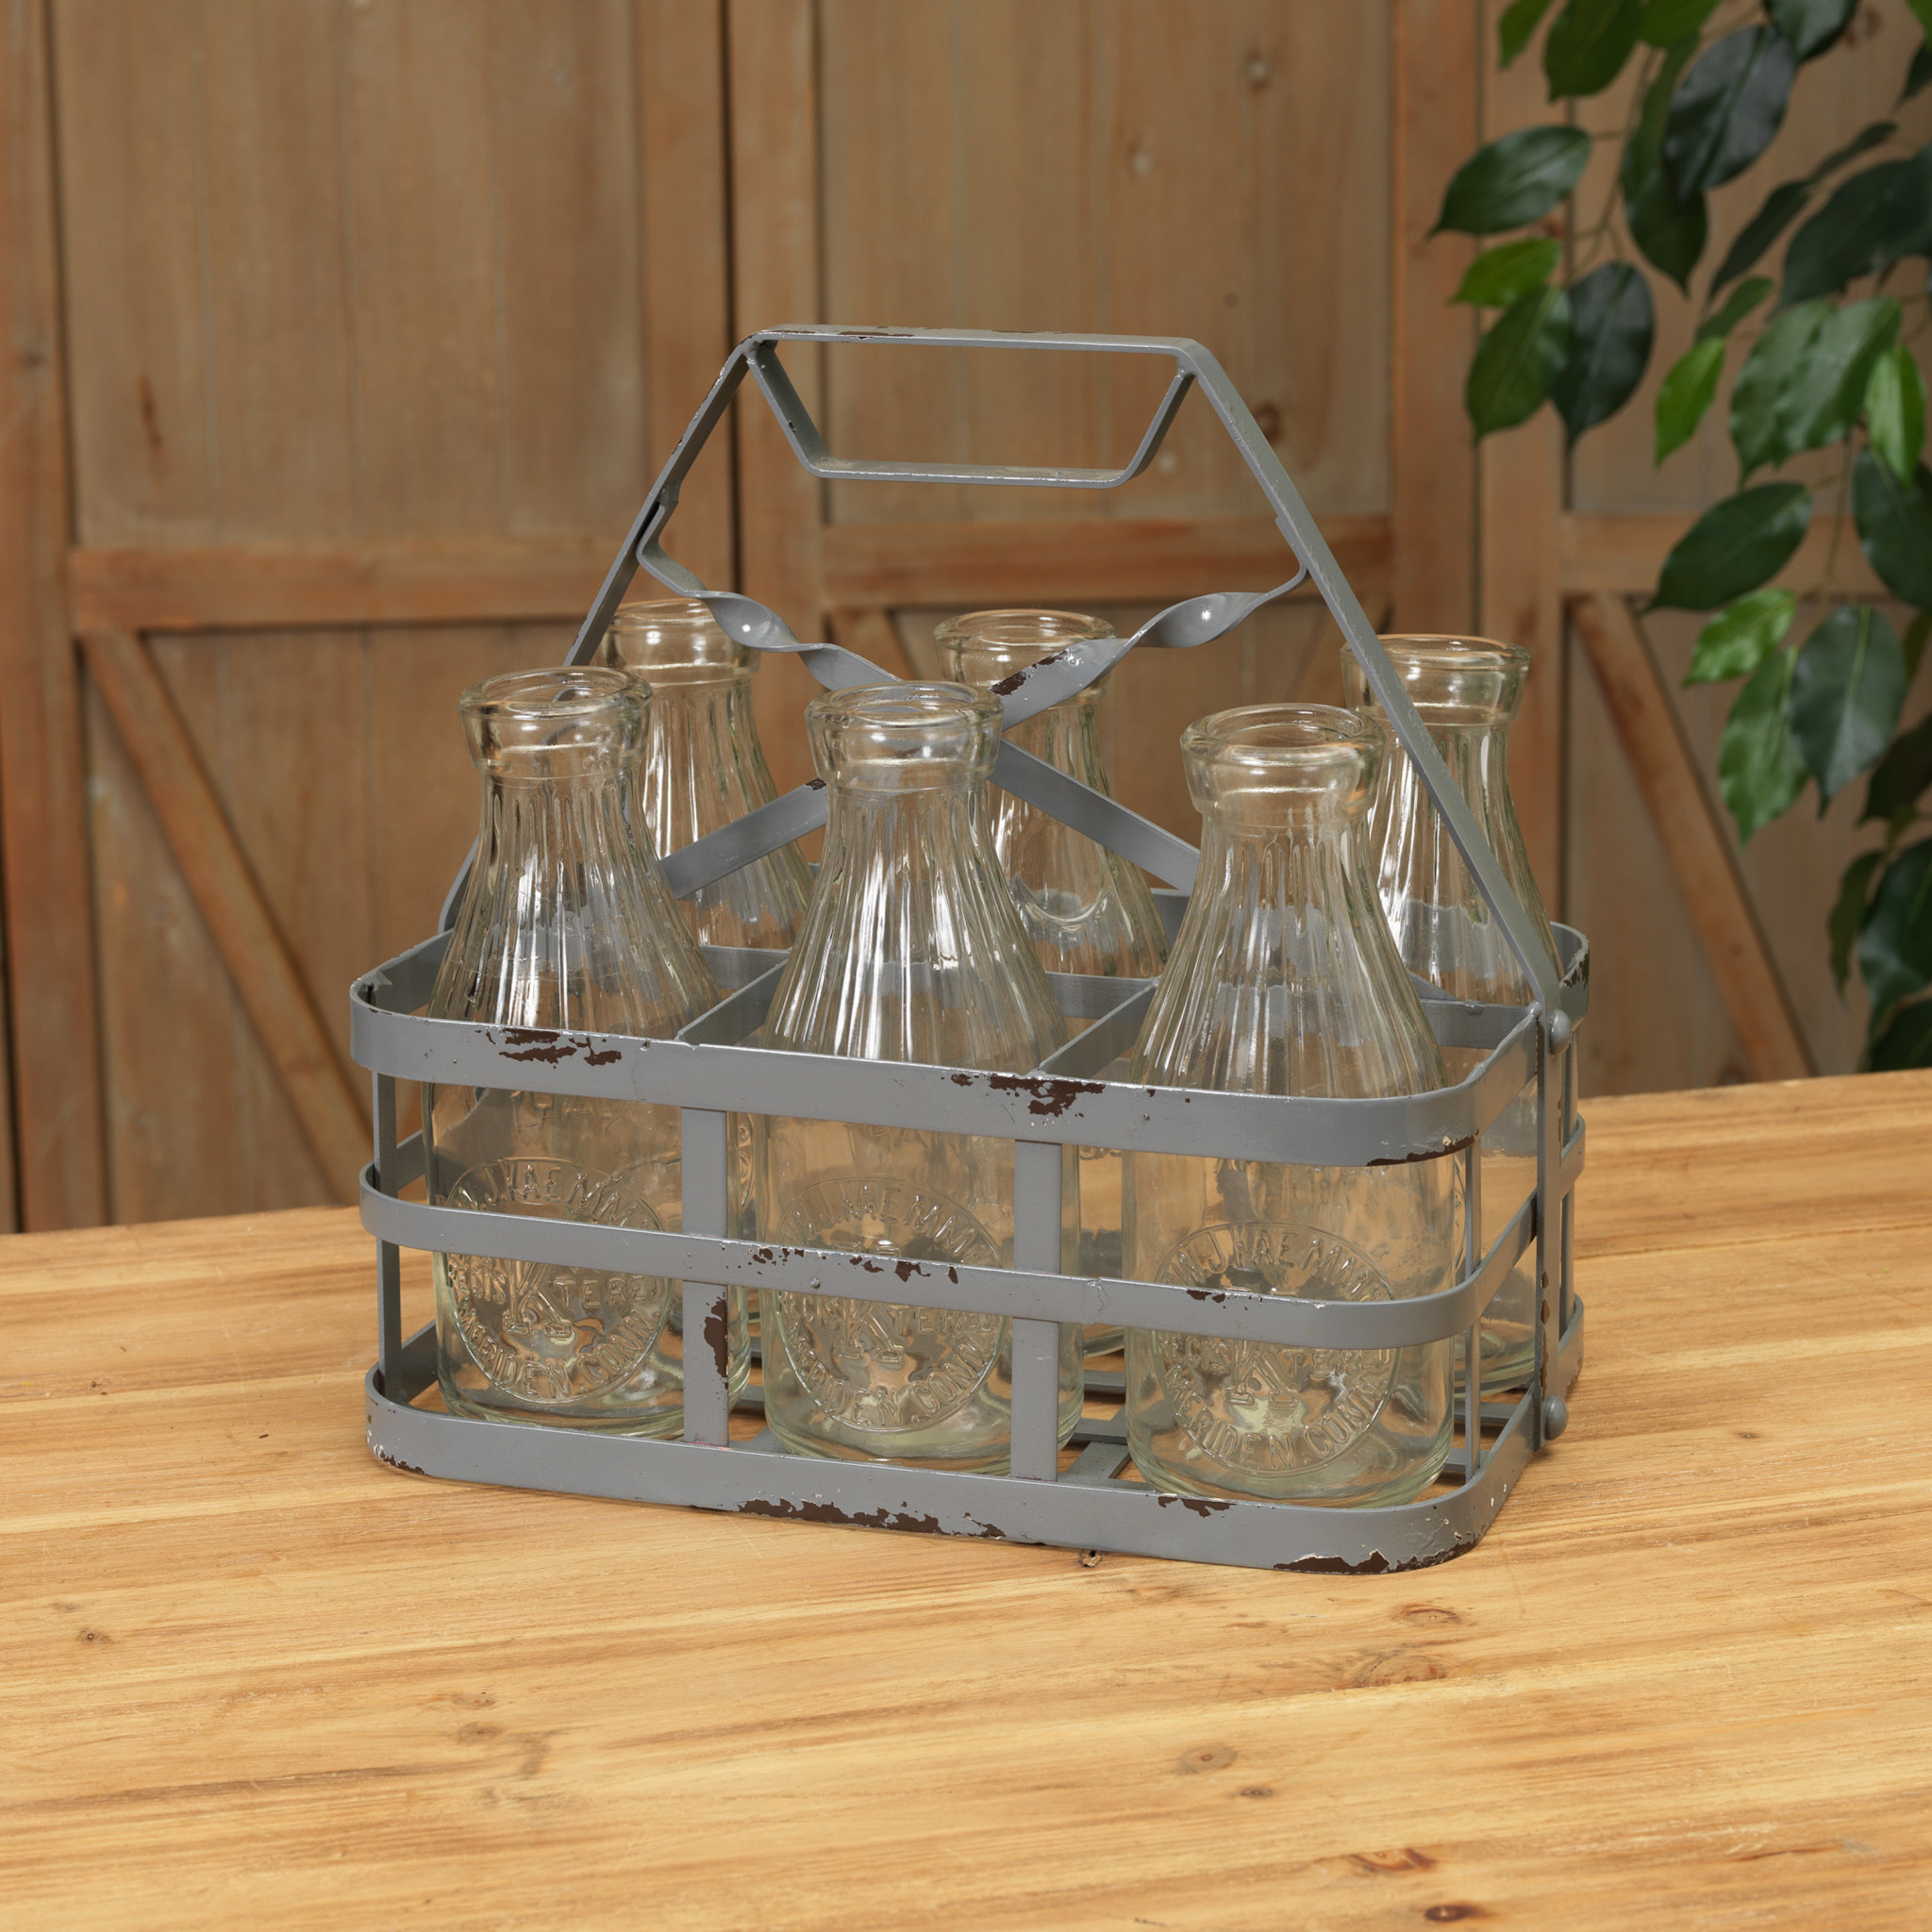 Antiqued Metal Basket Caddy with 6 Bottles